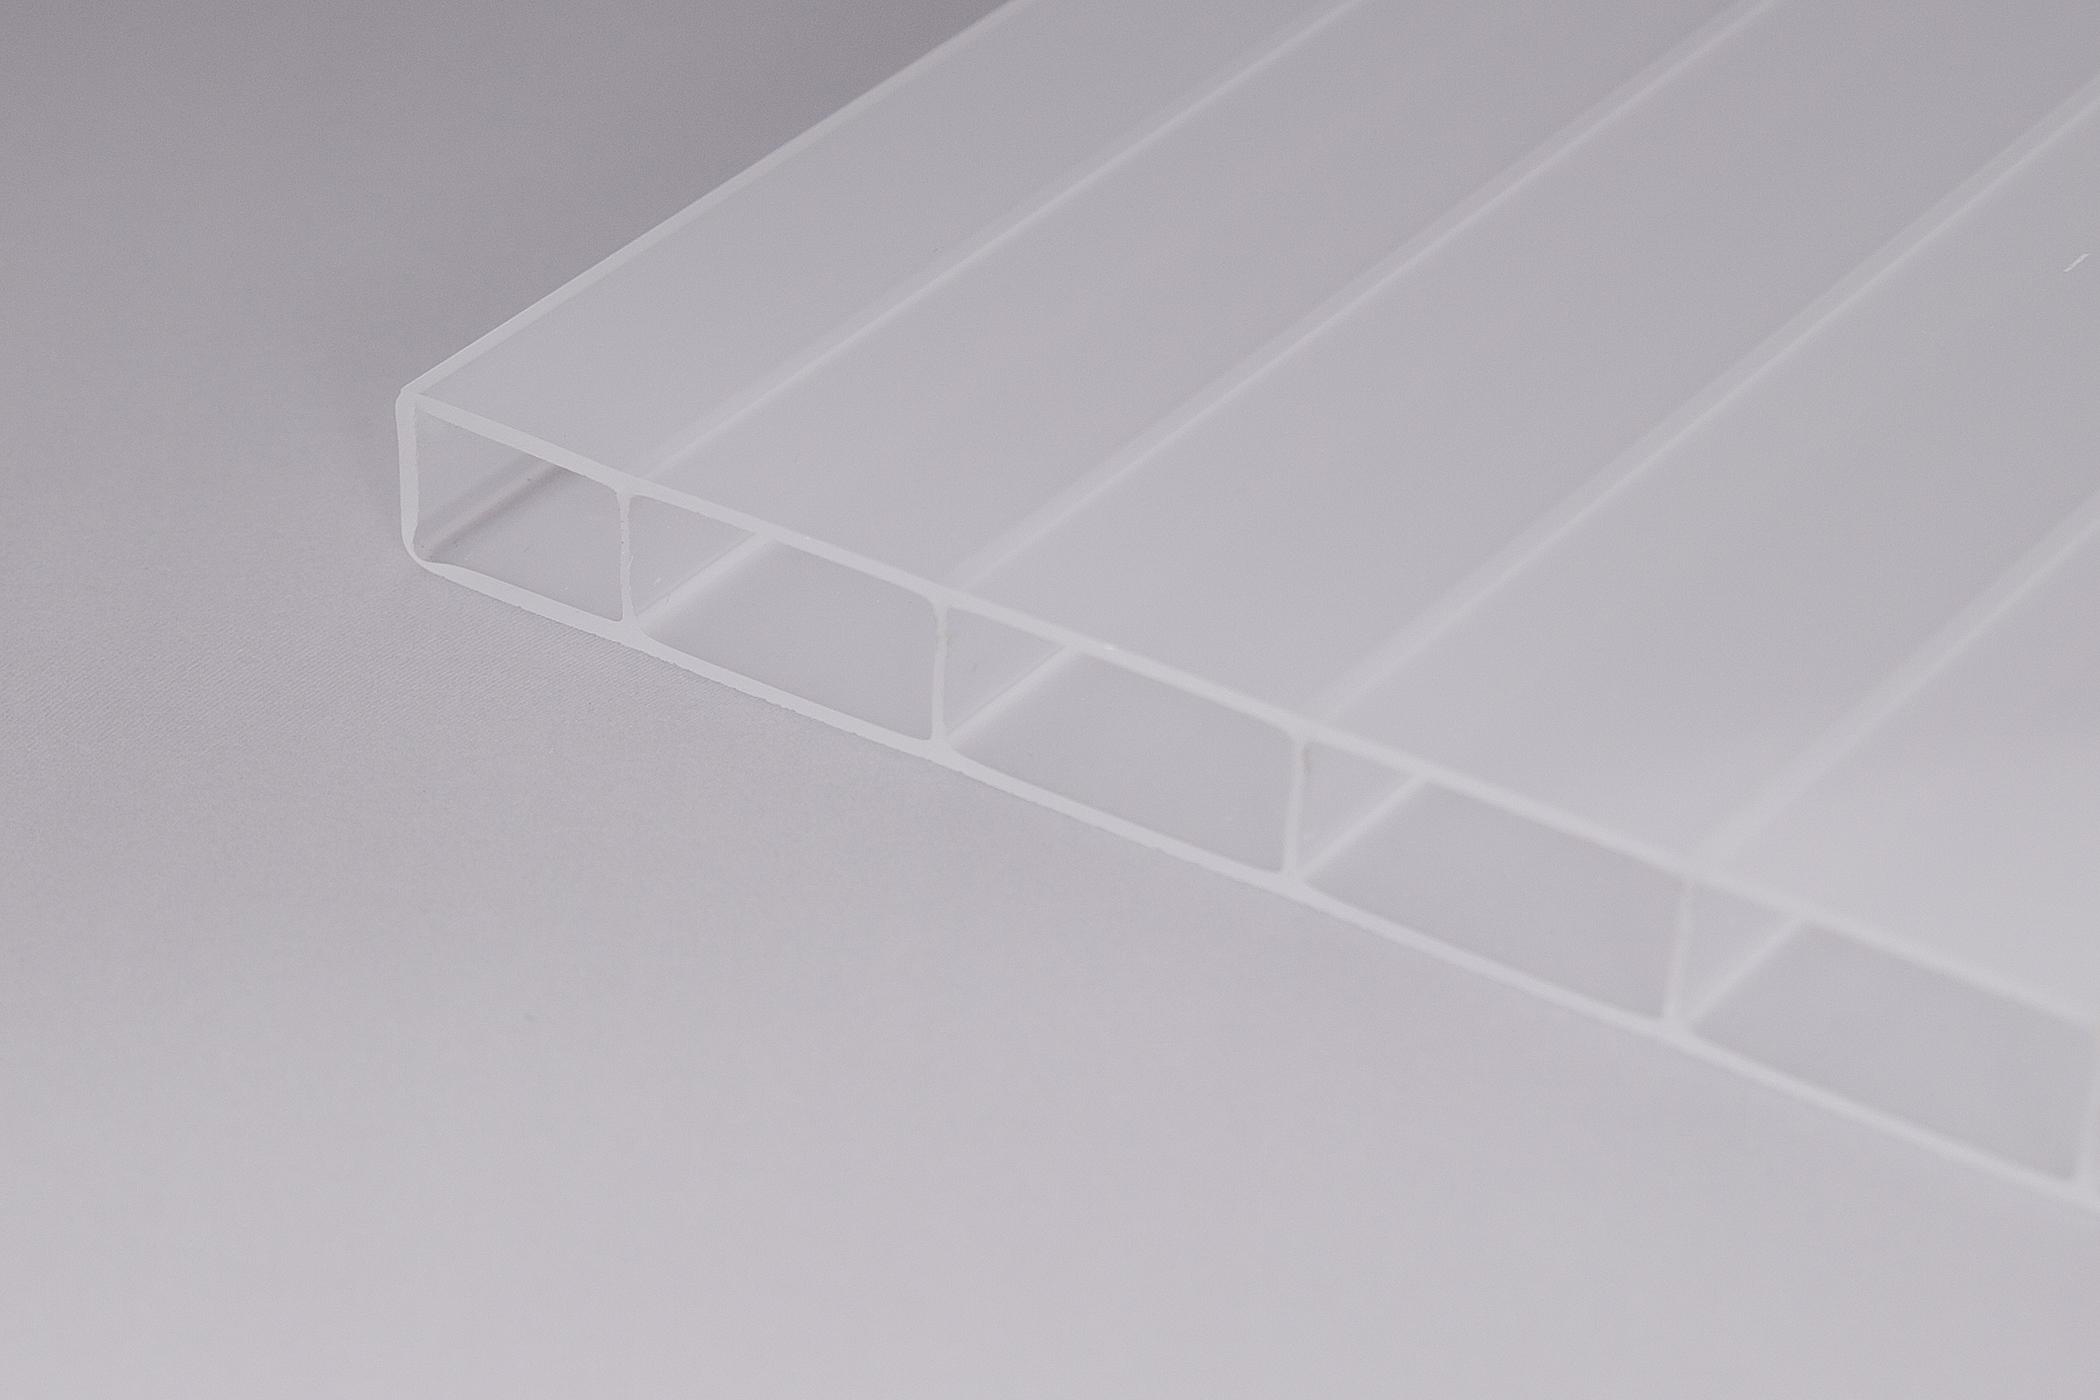 16mm doppelstegplatten acrylglas 16 32 weiss opal dachplatten z une sichtschutzelemente im. Black Bedroom Furniture Sets. Home Design Ideas